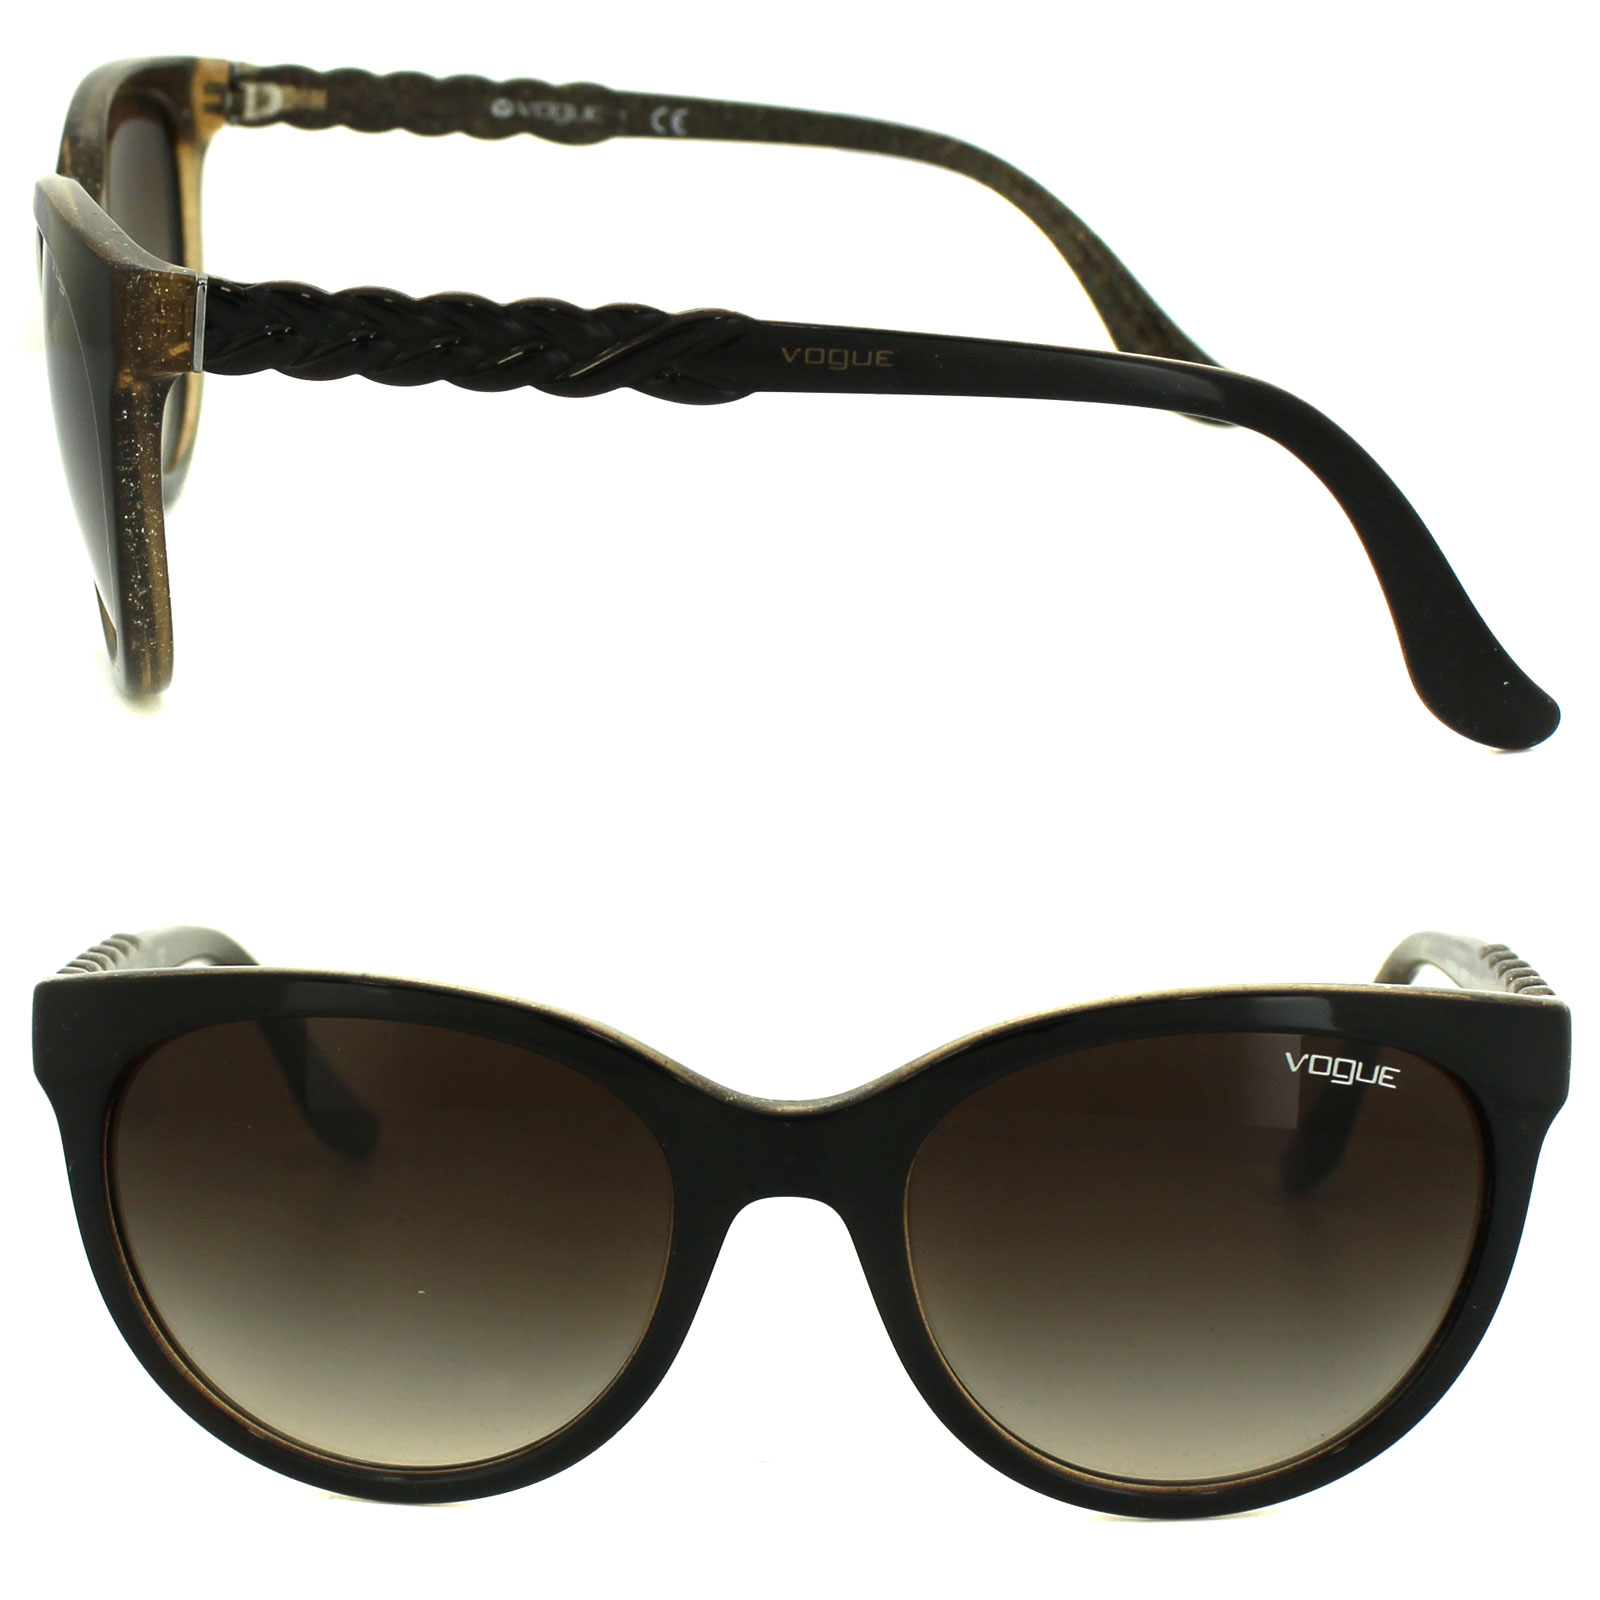 Cheap Vogue 2915s Sunglasses Discounted Sunglasses